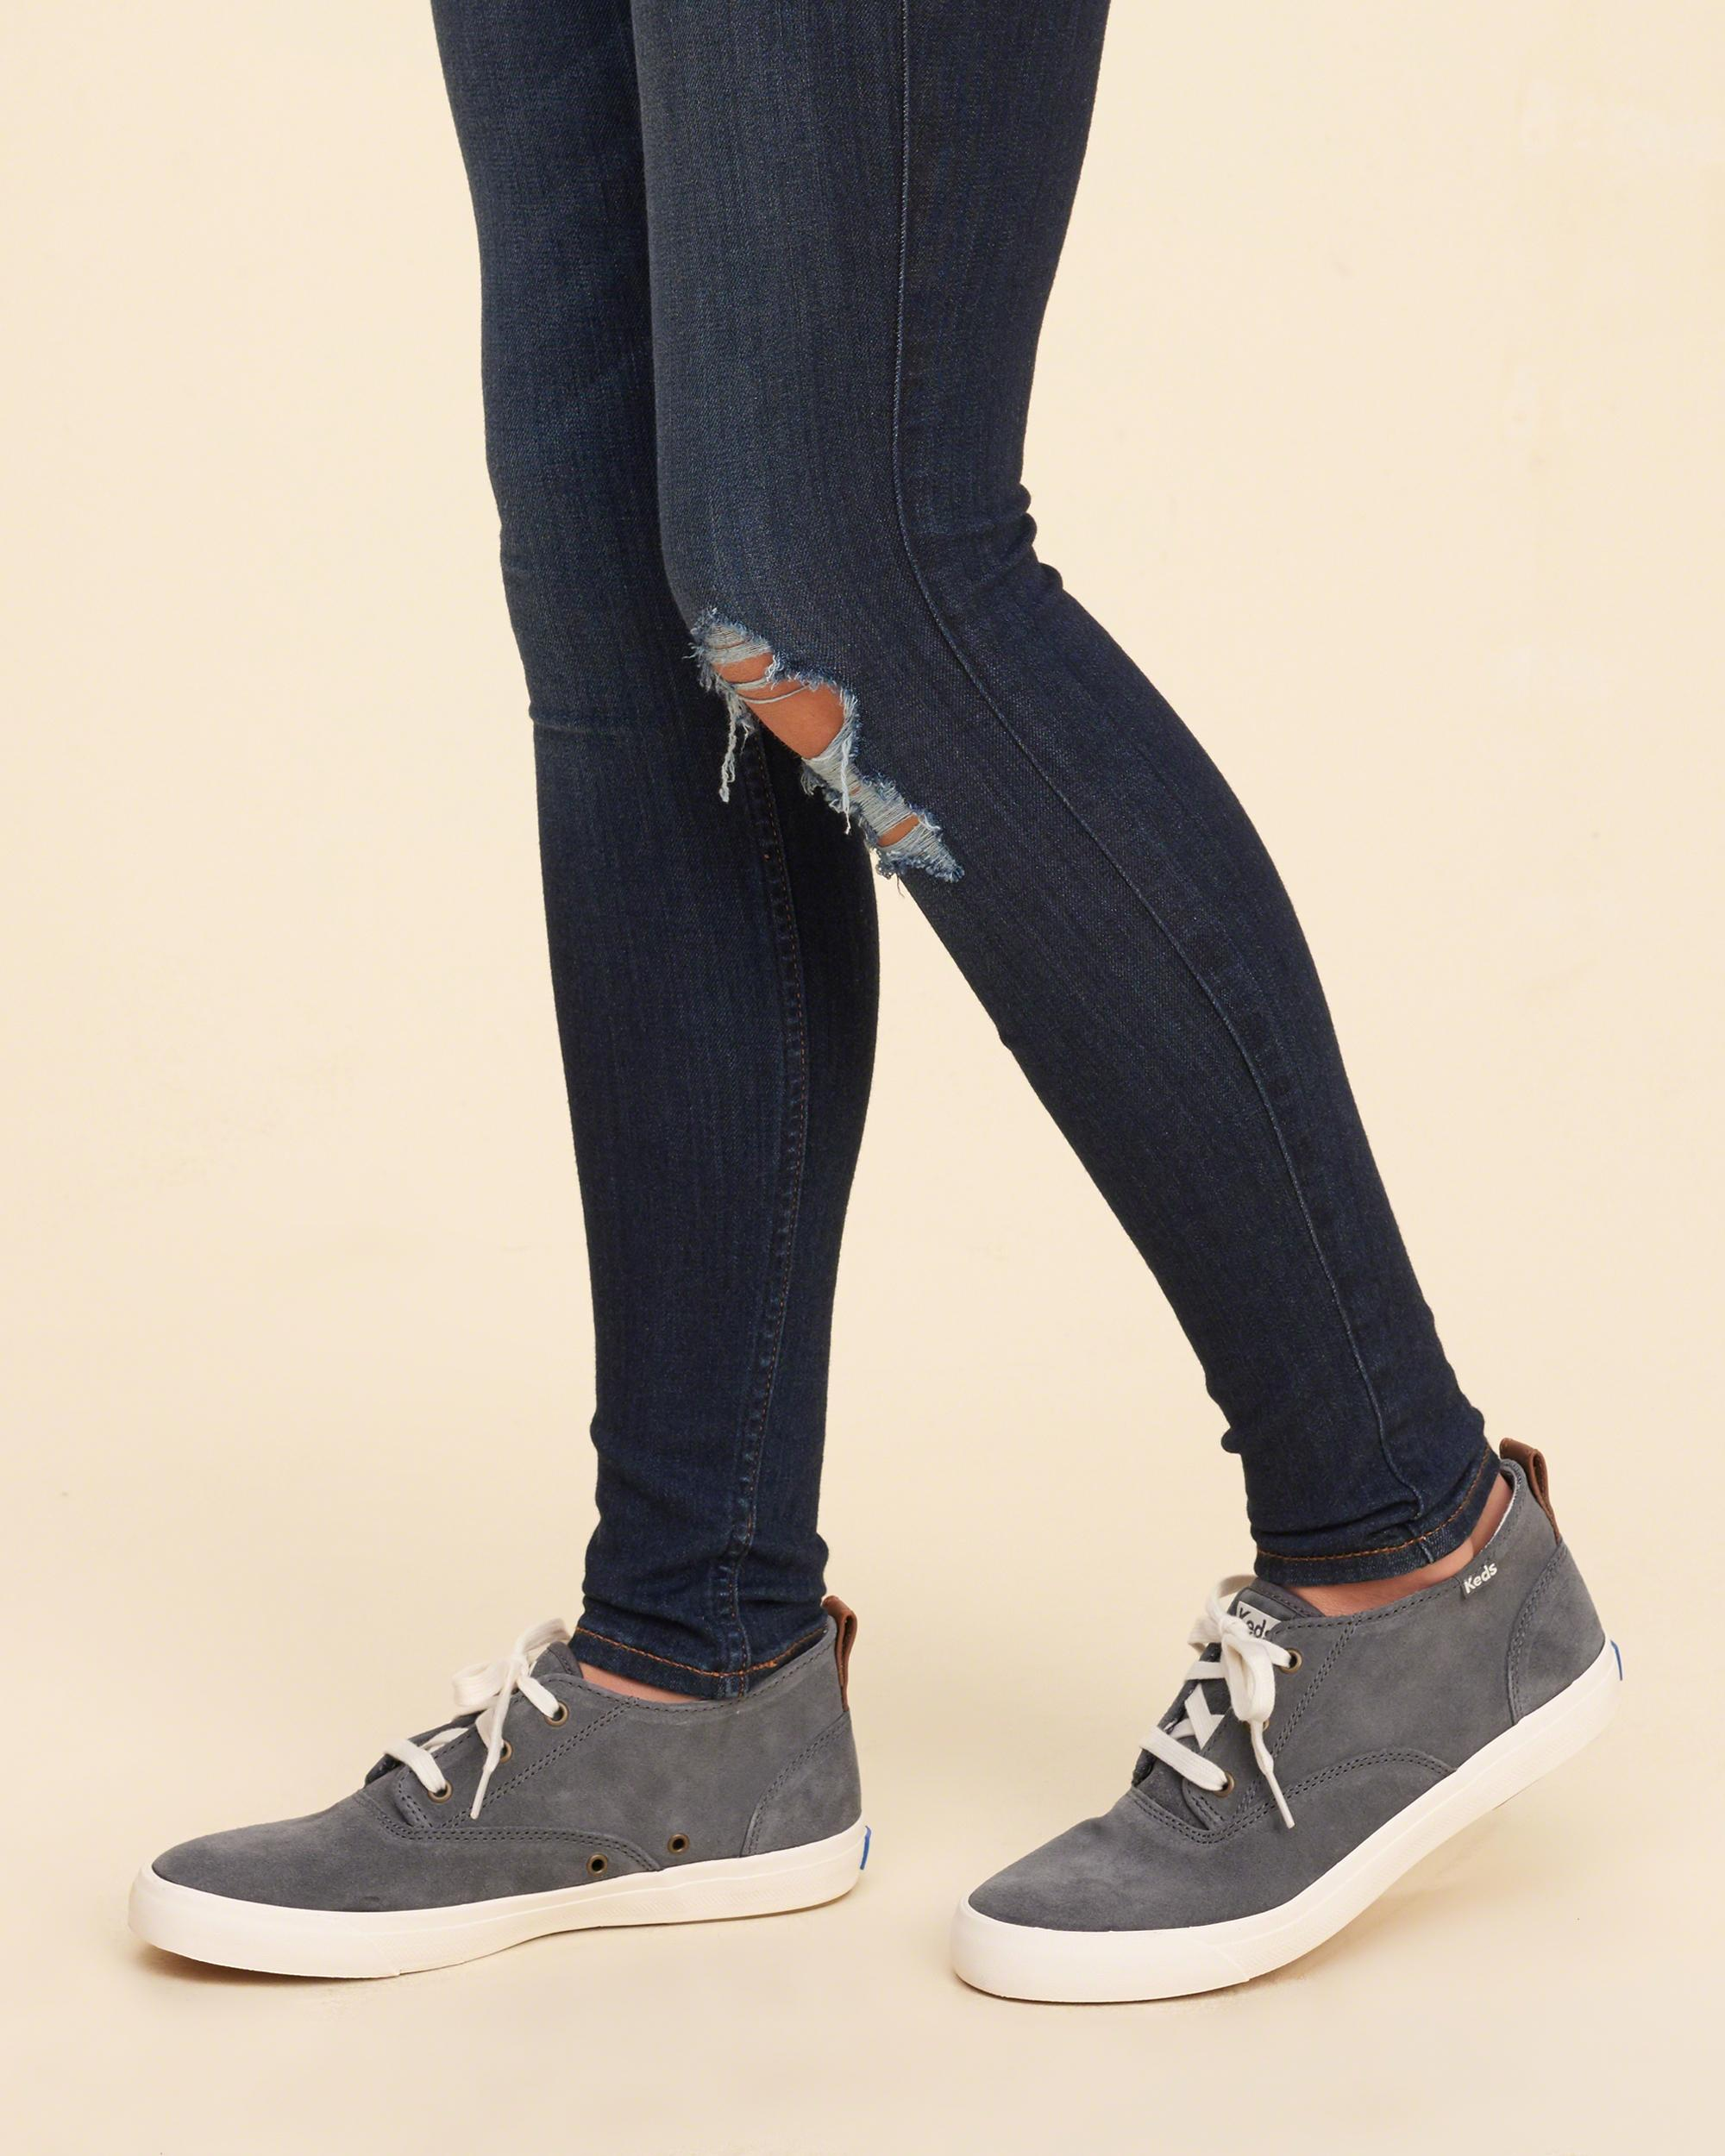 Keds Black Suede Shoes